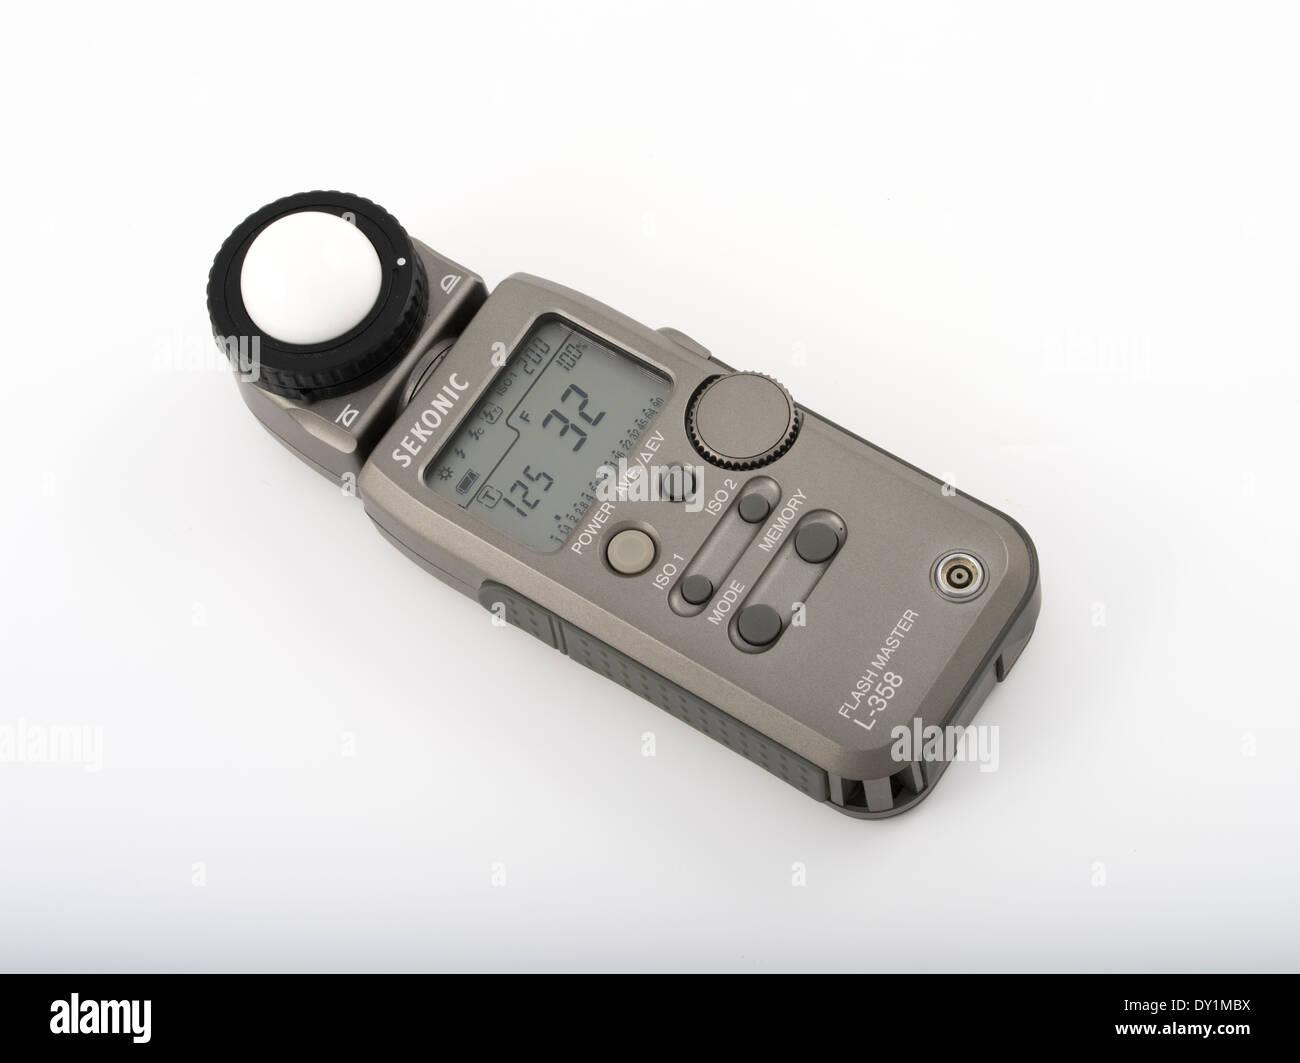 Sekonic Flashmaster L-358 Lightmeter Light Meter for photography cinematography Stock Photo